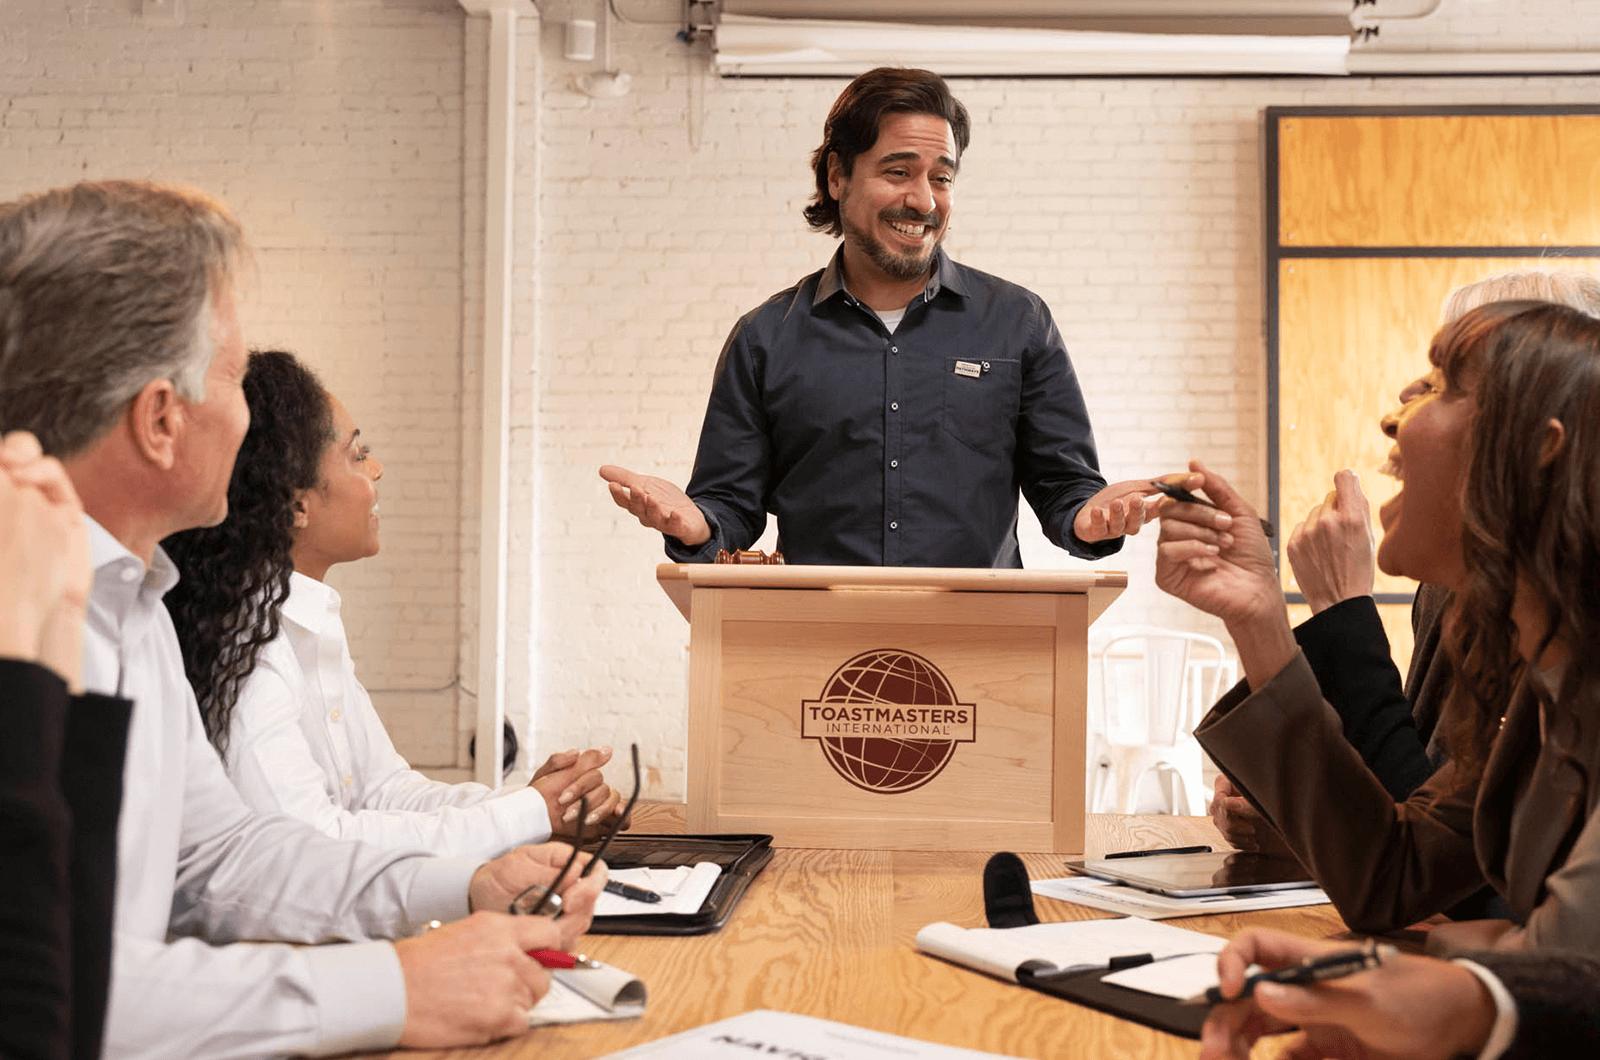 Man standing at lectern telling joke to people around table